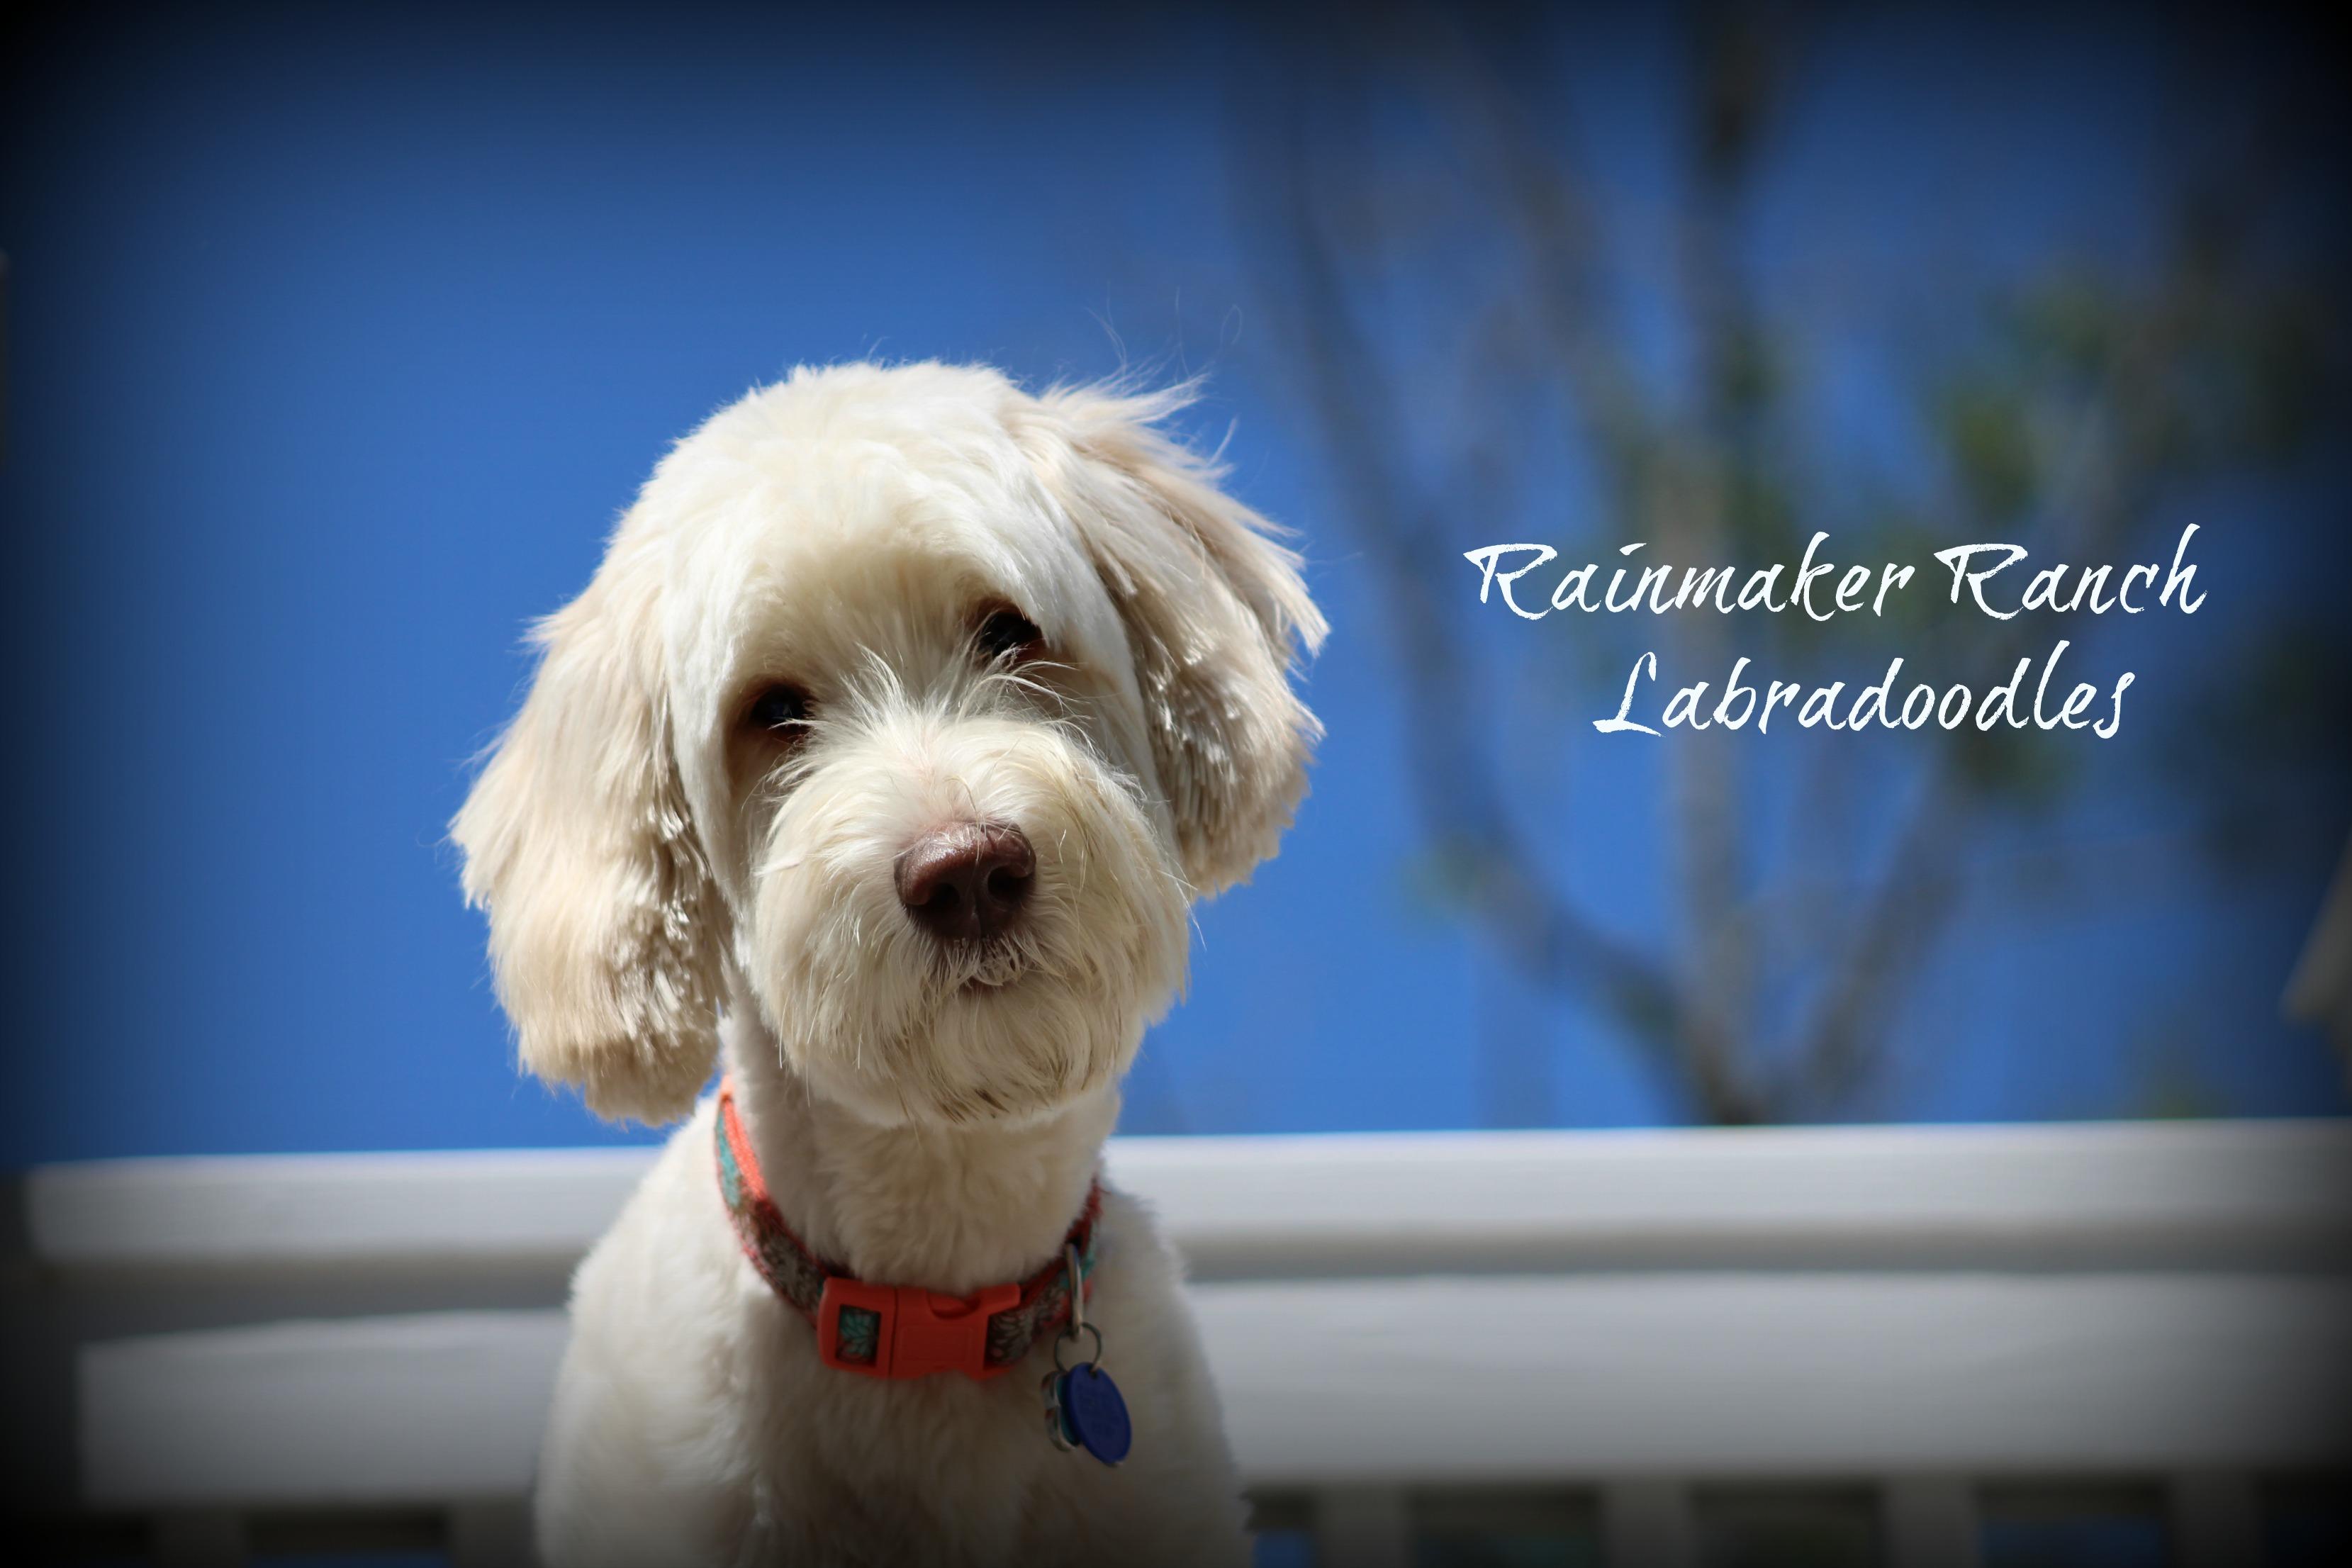 Australian Labradoodle Parent Dogs at Rainmaker Ranch